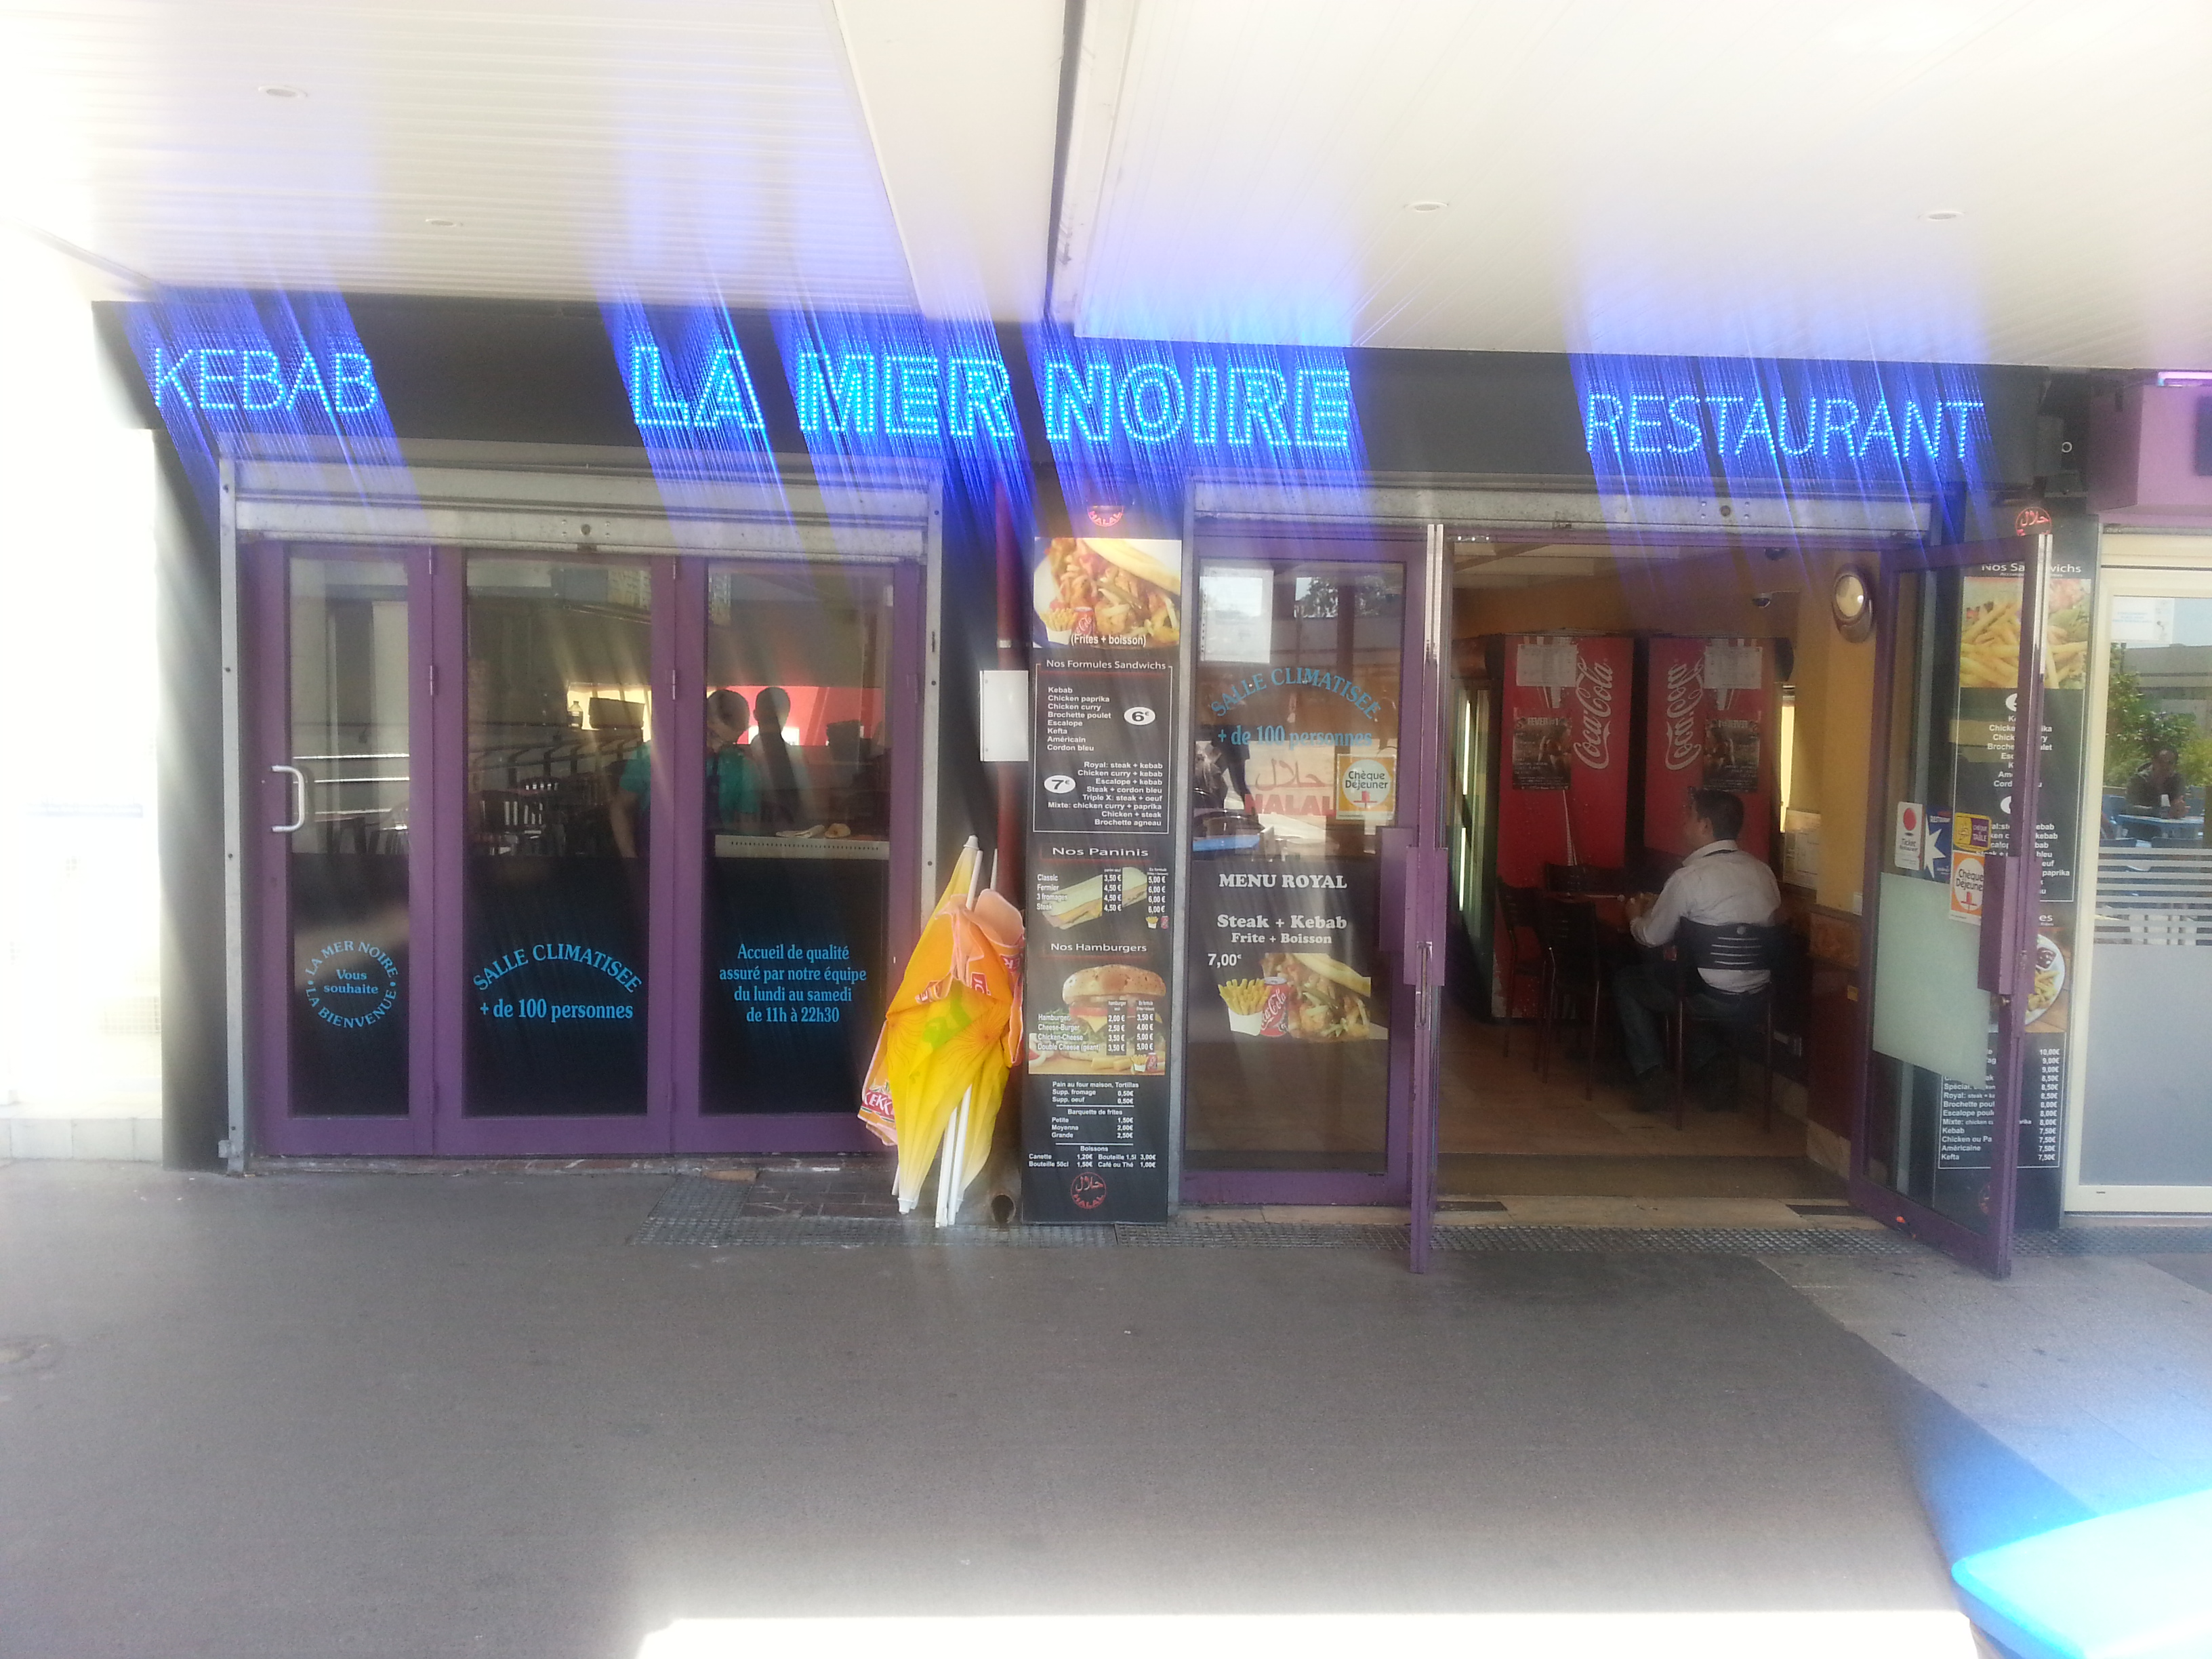 La mer noire cergy avis tarifs horaires t l phone for Divan kebab carte